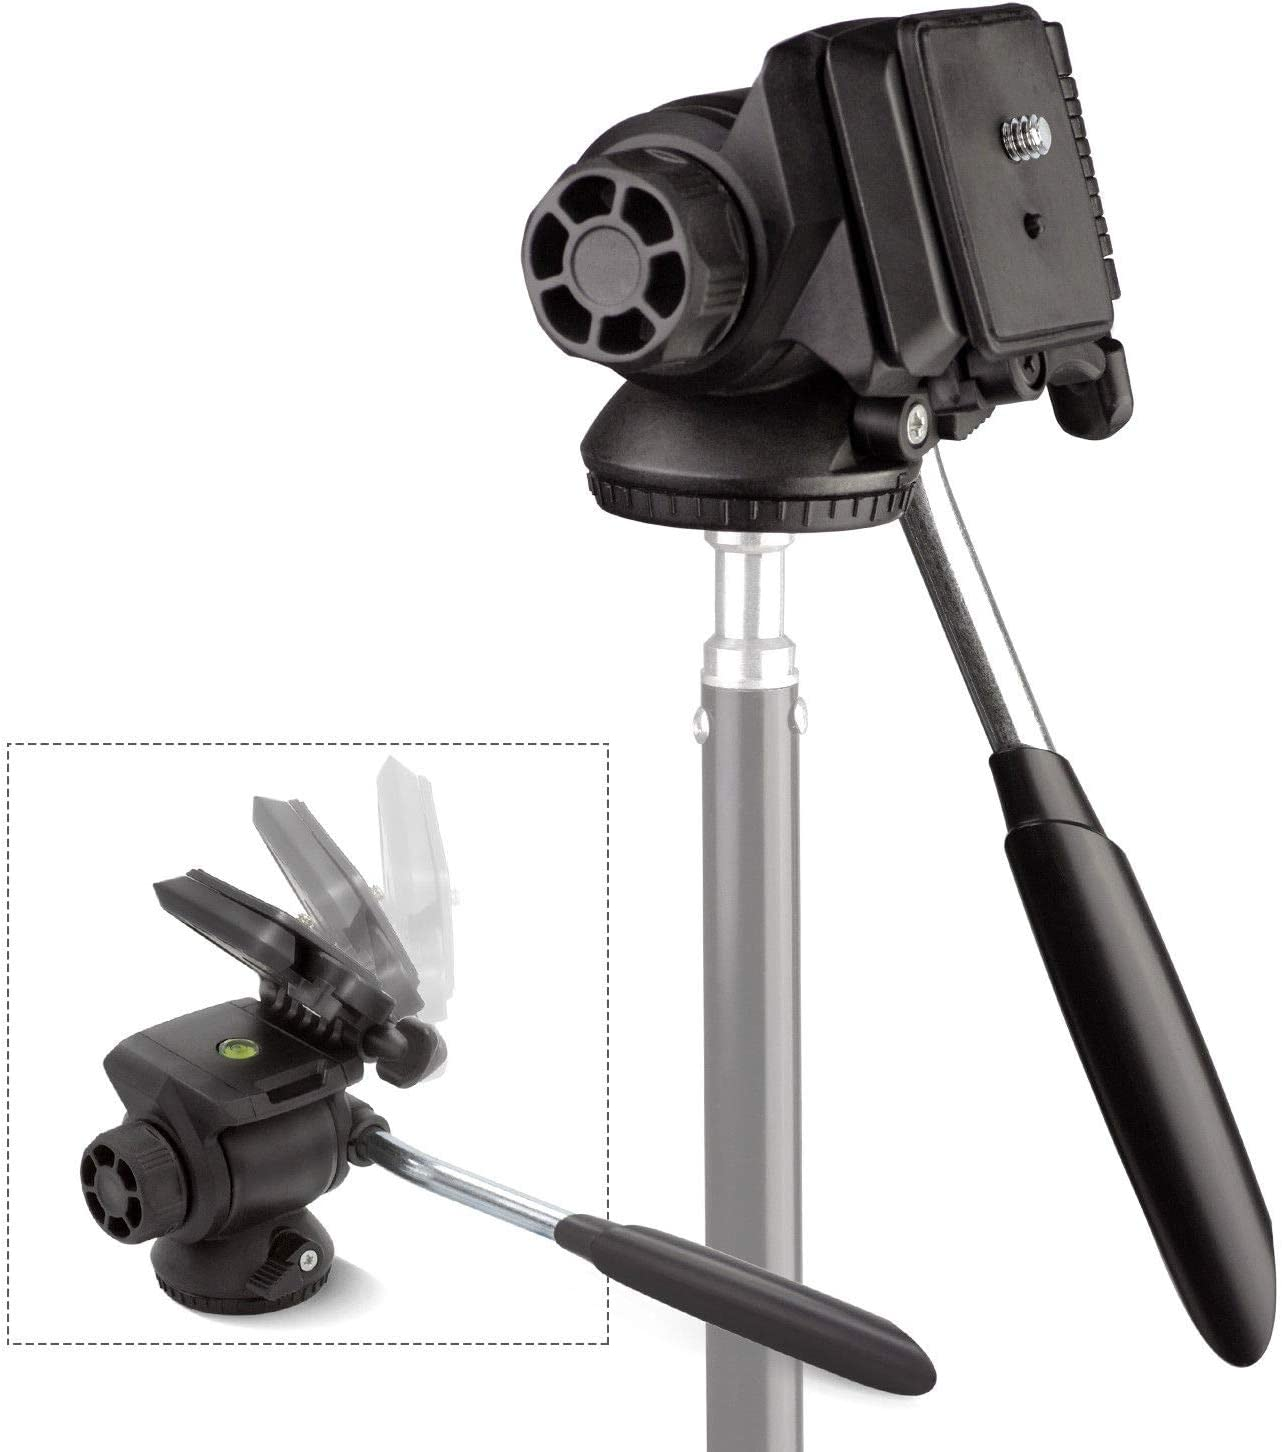 Three Axis Angle Adjustable Studio Camera Tripod Mount w//Quick Release Plate